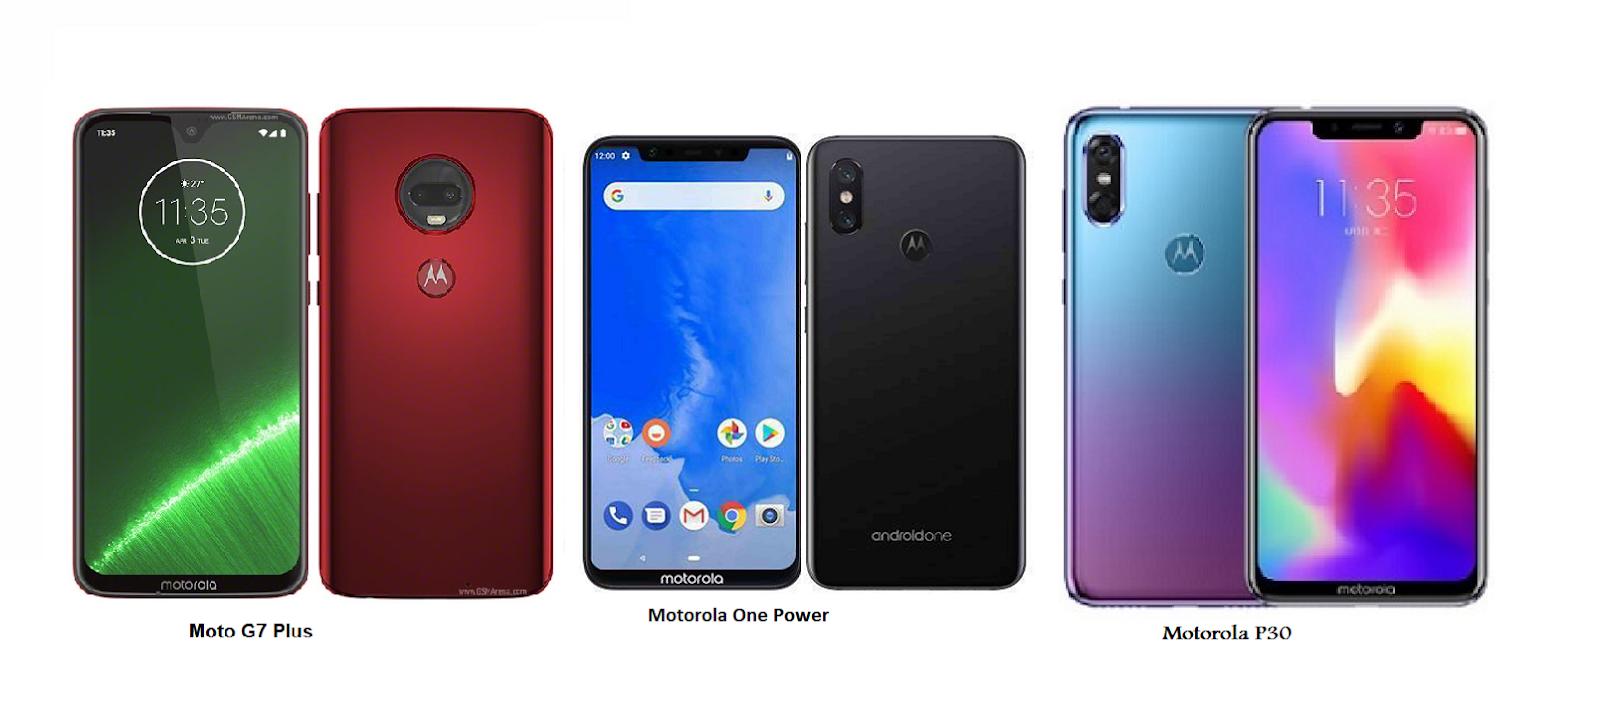 d3107362e97 Motorola P30 Vs Motorola Moto G7 Plus Vs Motorola One Power Specs  Comparisons